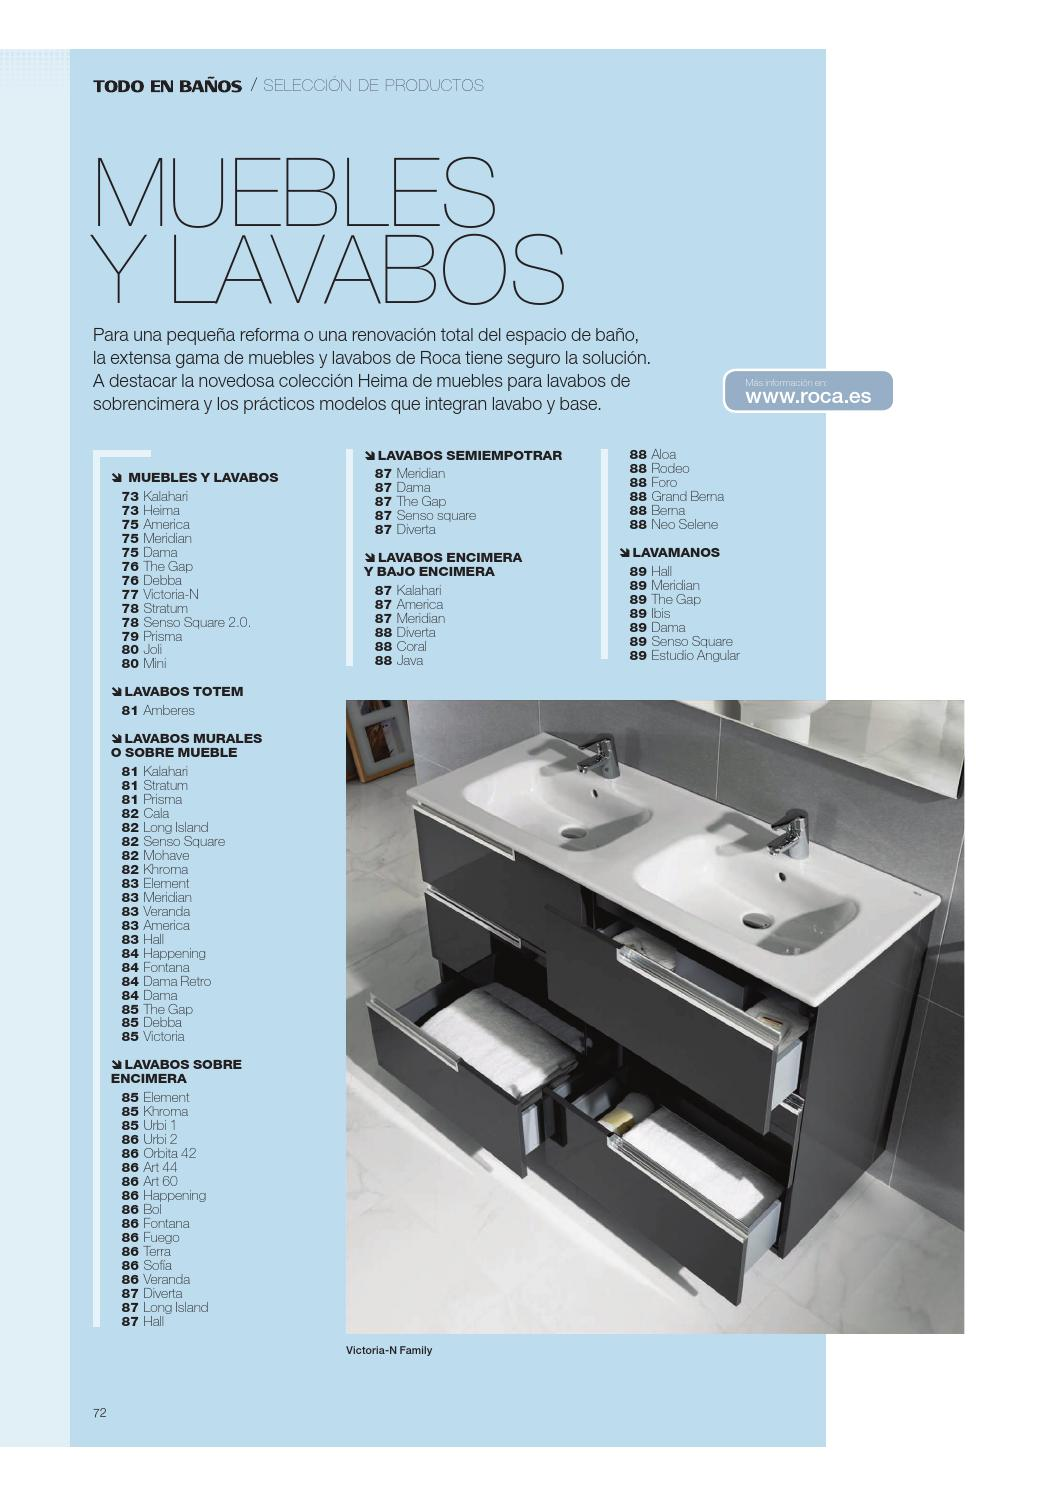 Lavabo Urbi 1 De Roca.Lavabos Roca 2014 By Servidaya Issuu